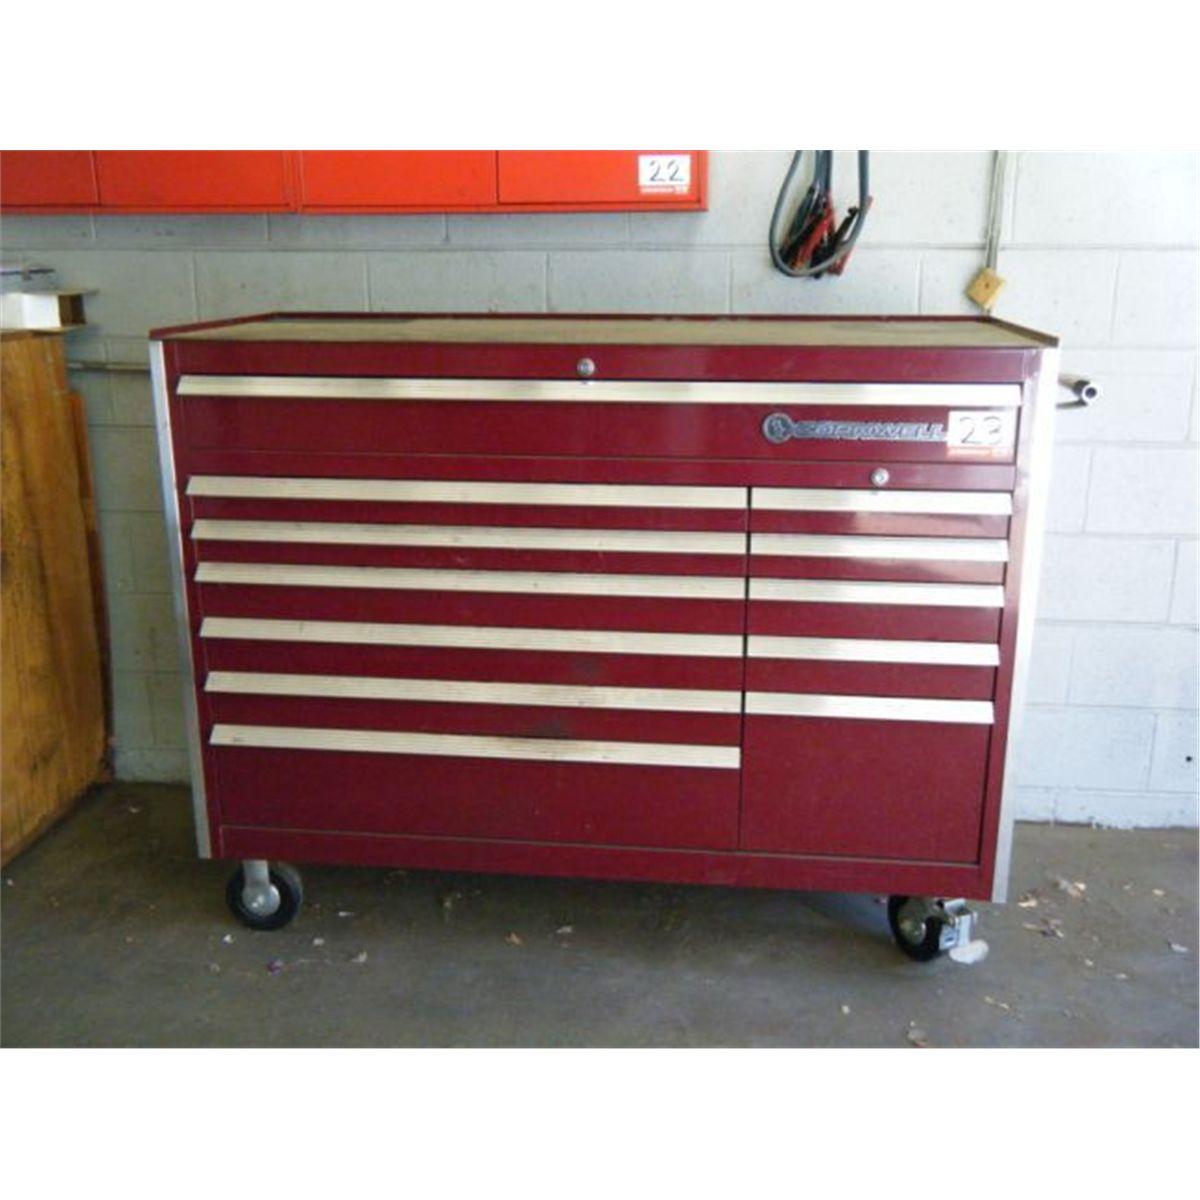 Sell Or Buy A Used Cornwell 84 Custom Series Tool Box